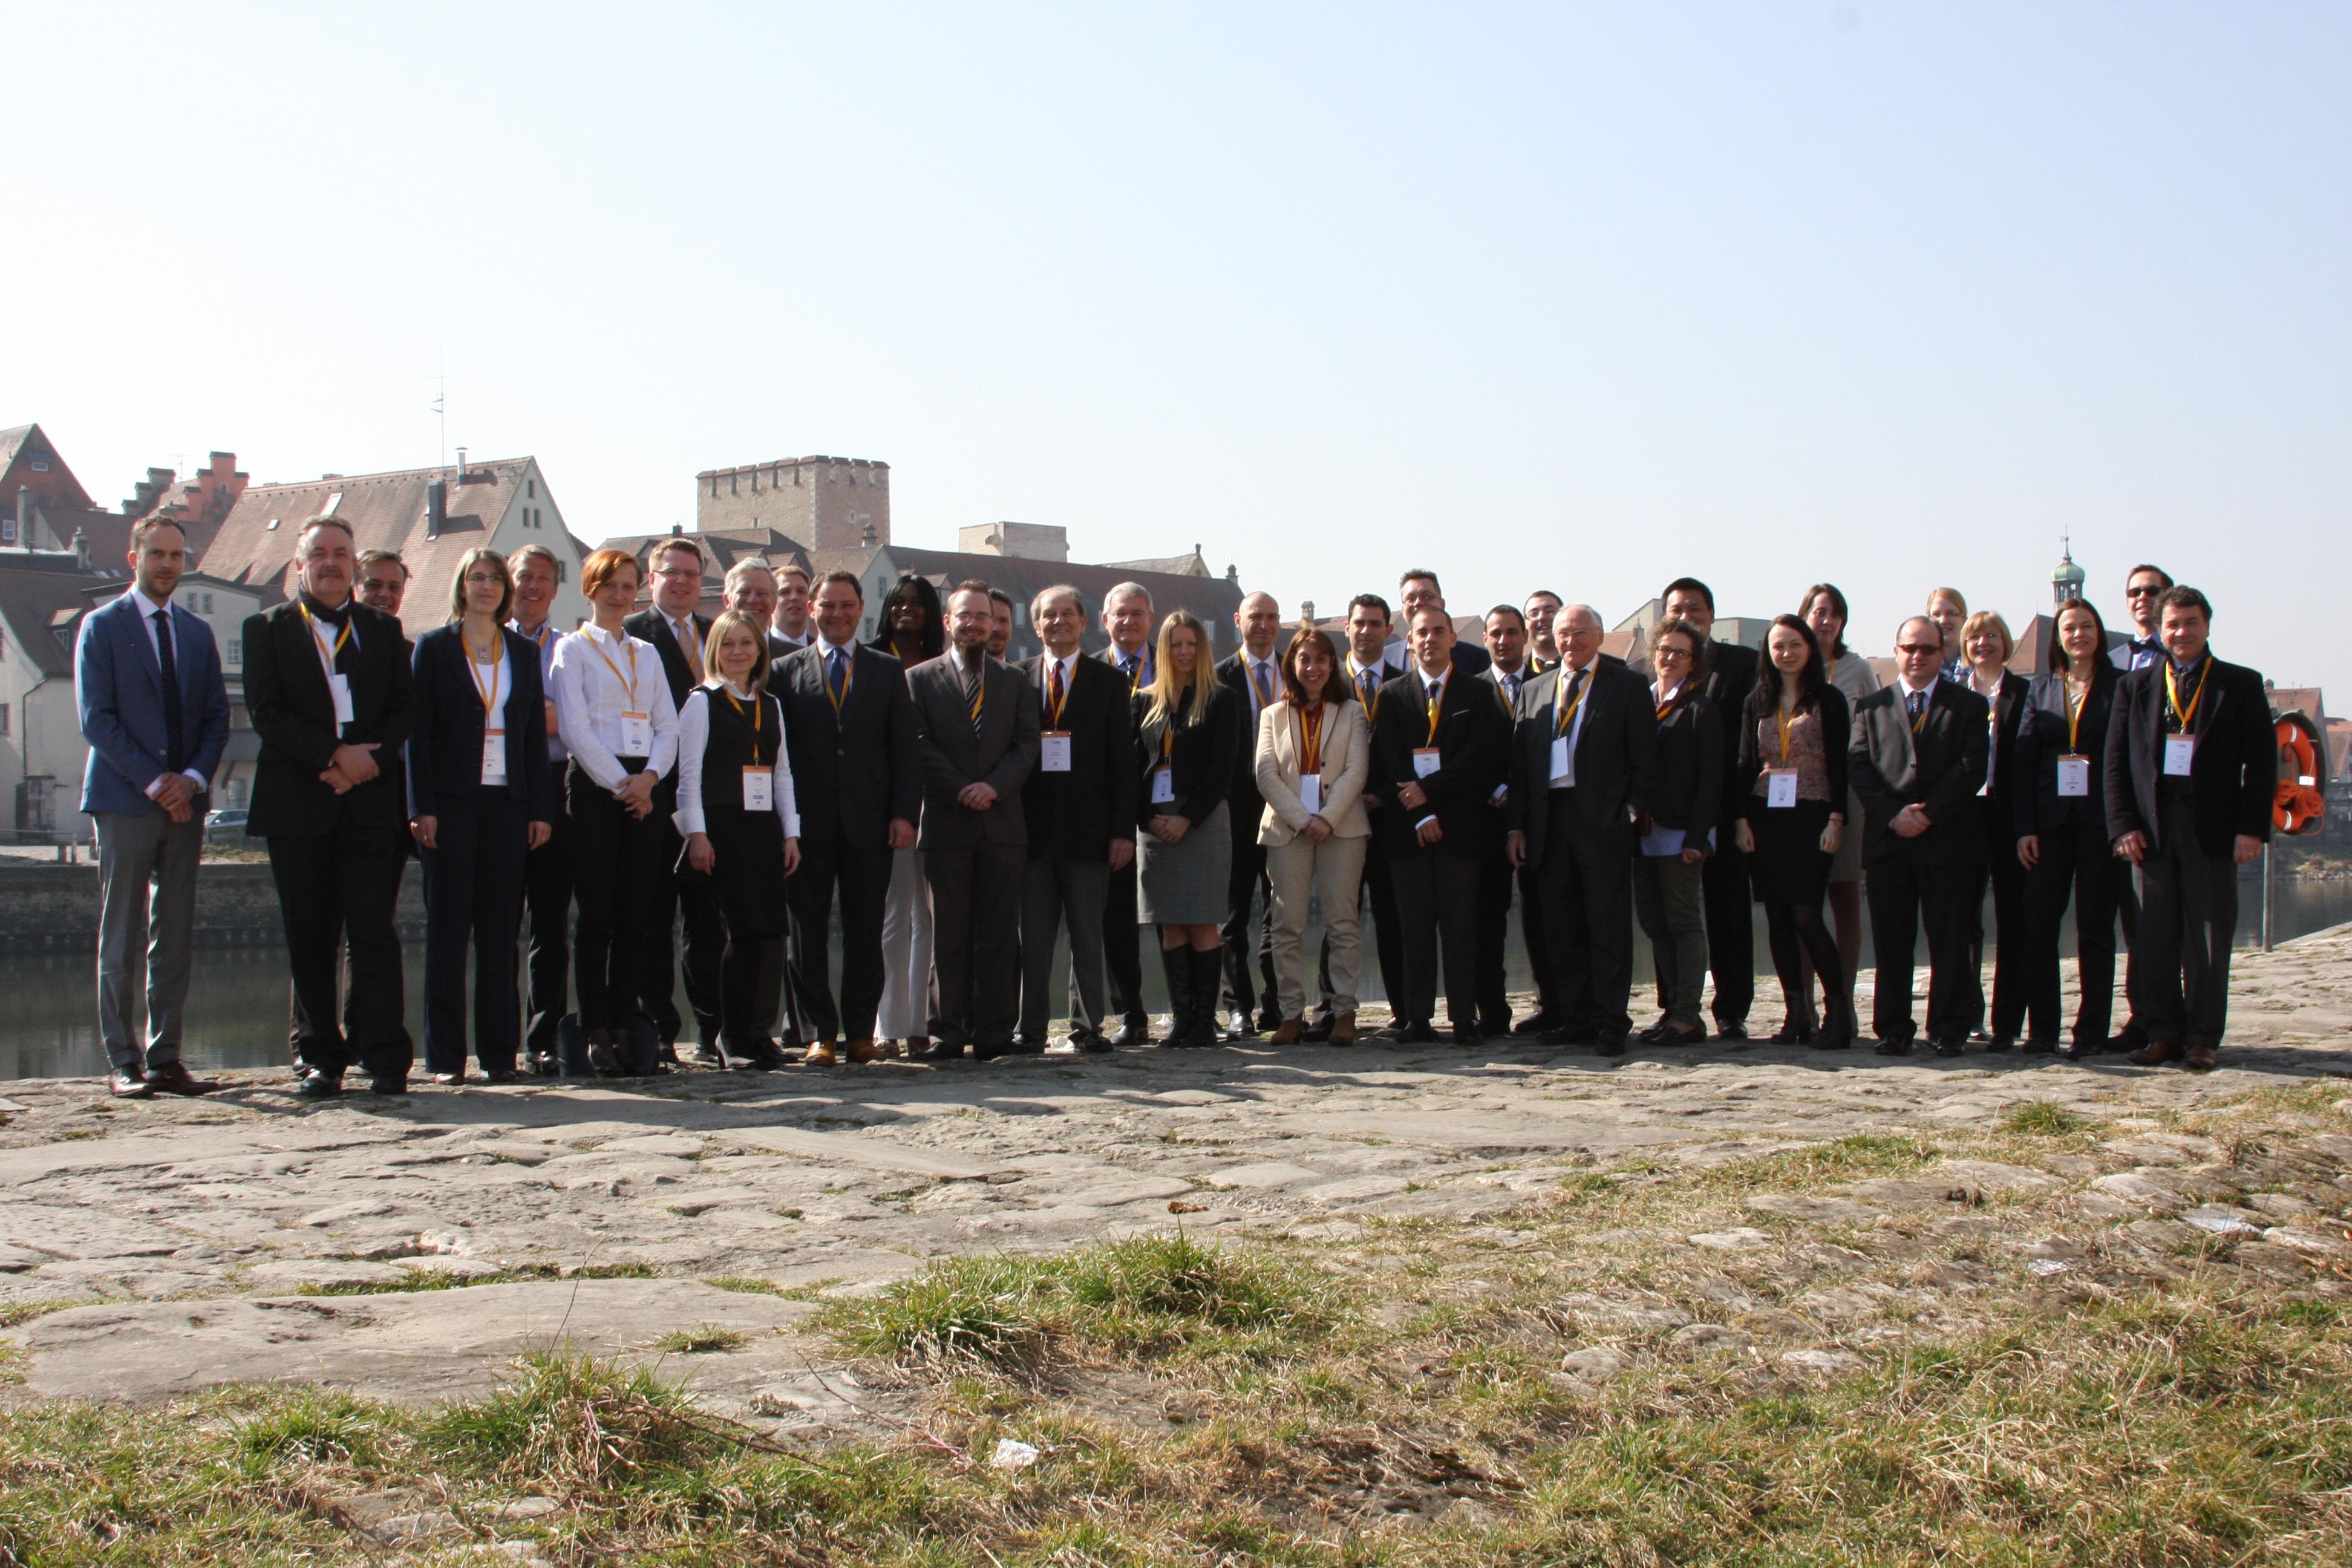 TRA meeting 2014 Regensburg, Germany